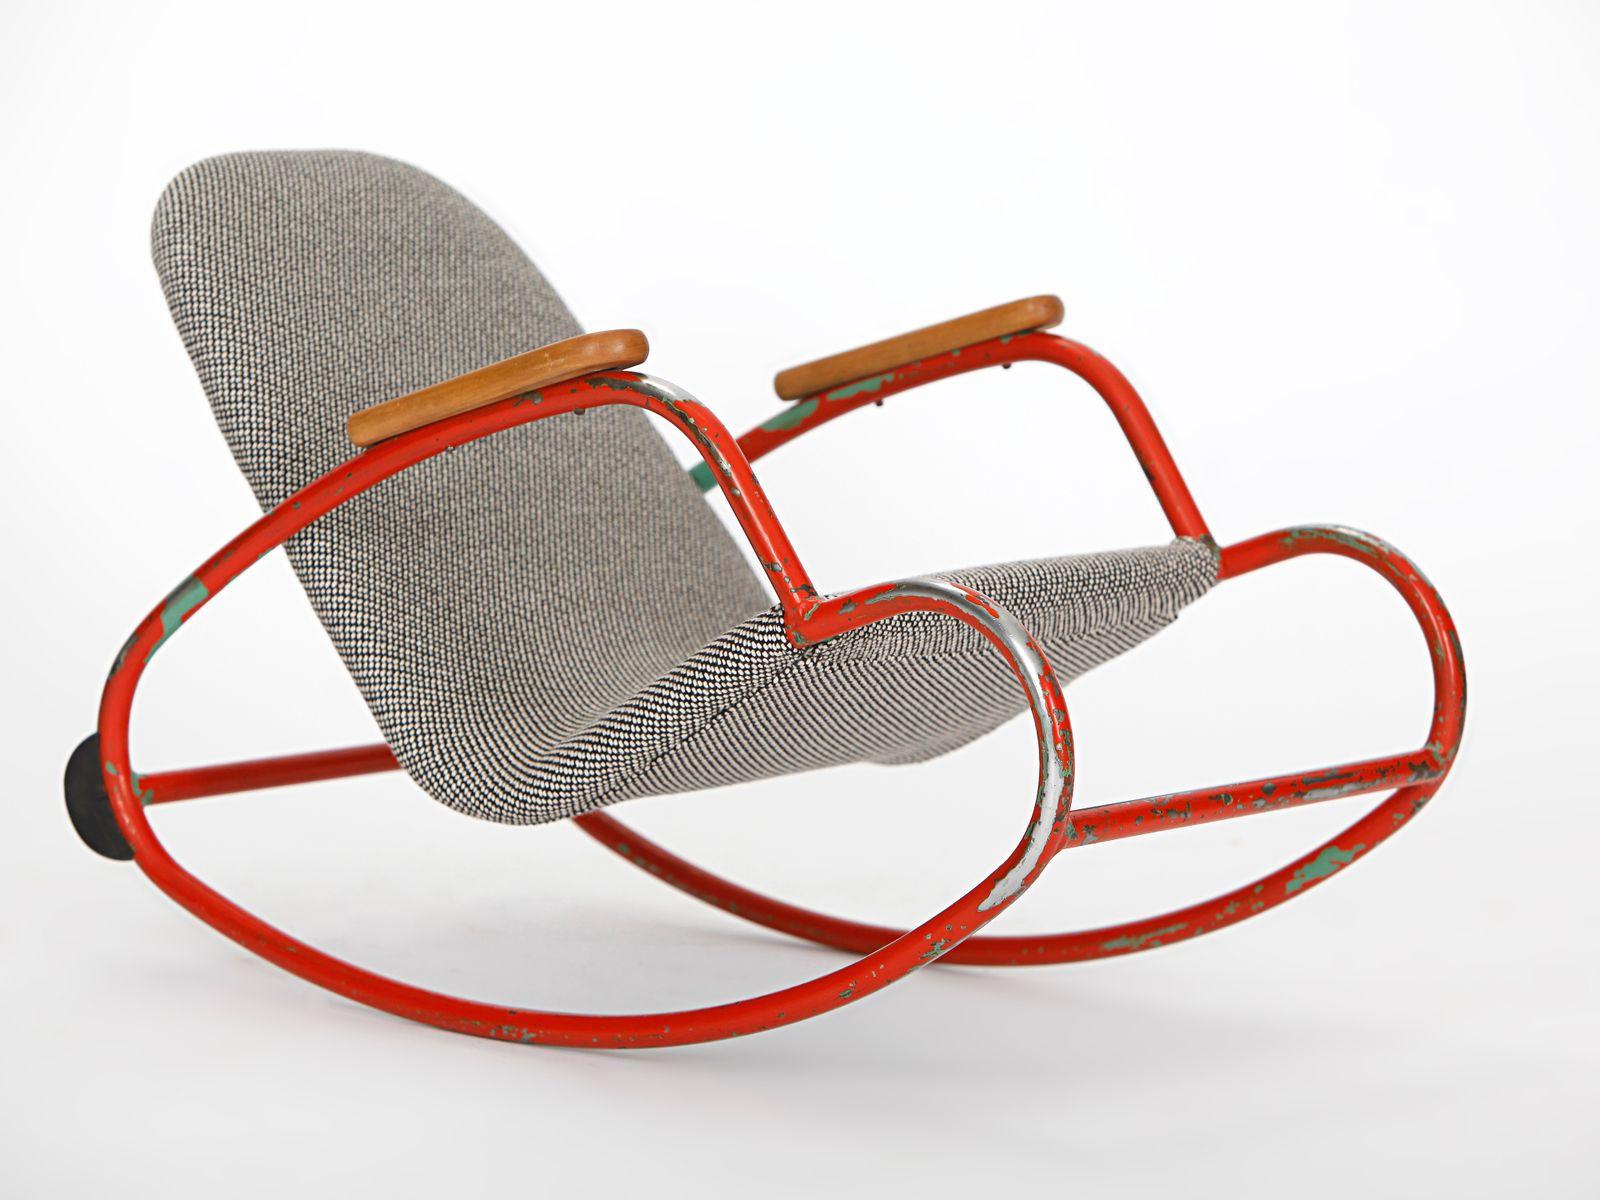 kinder schaukelstuhl aus gebogenem rohrstahl 1960er bei pamono kaufen. Black Bedroom Furniture Sets. Home Design Ideas